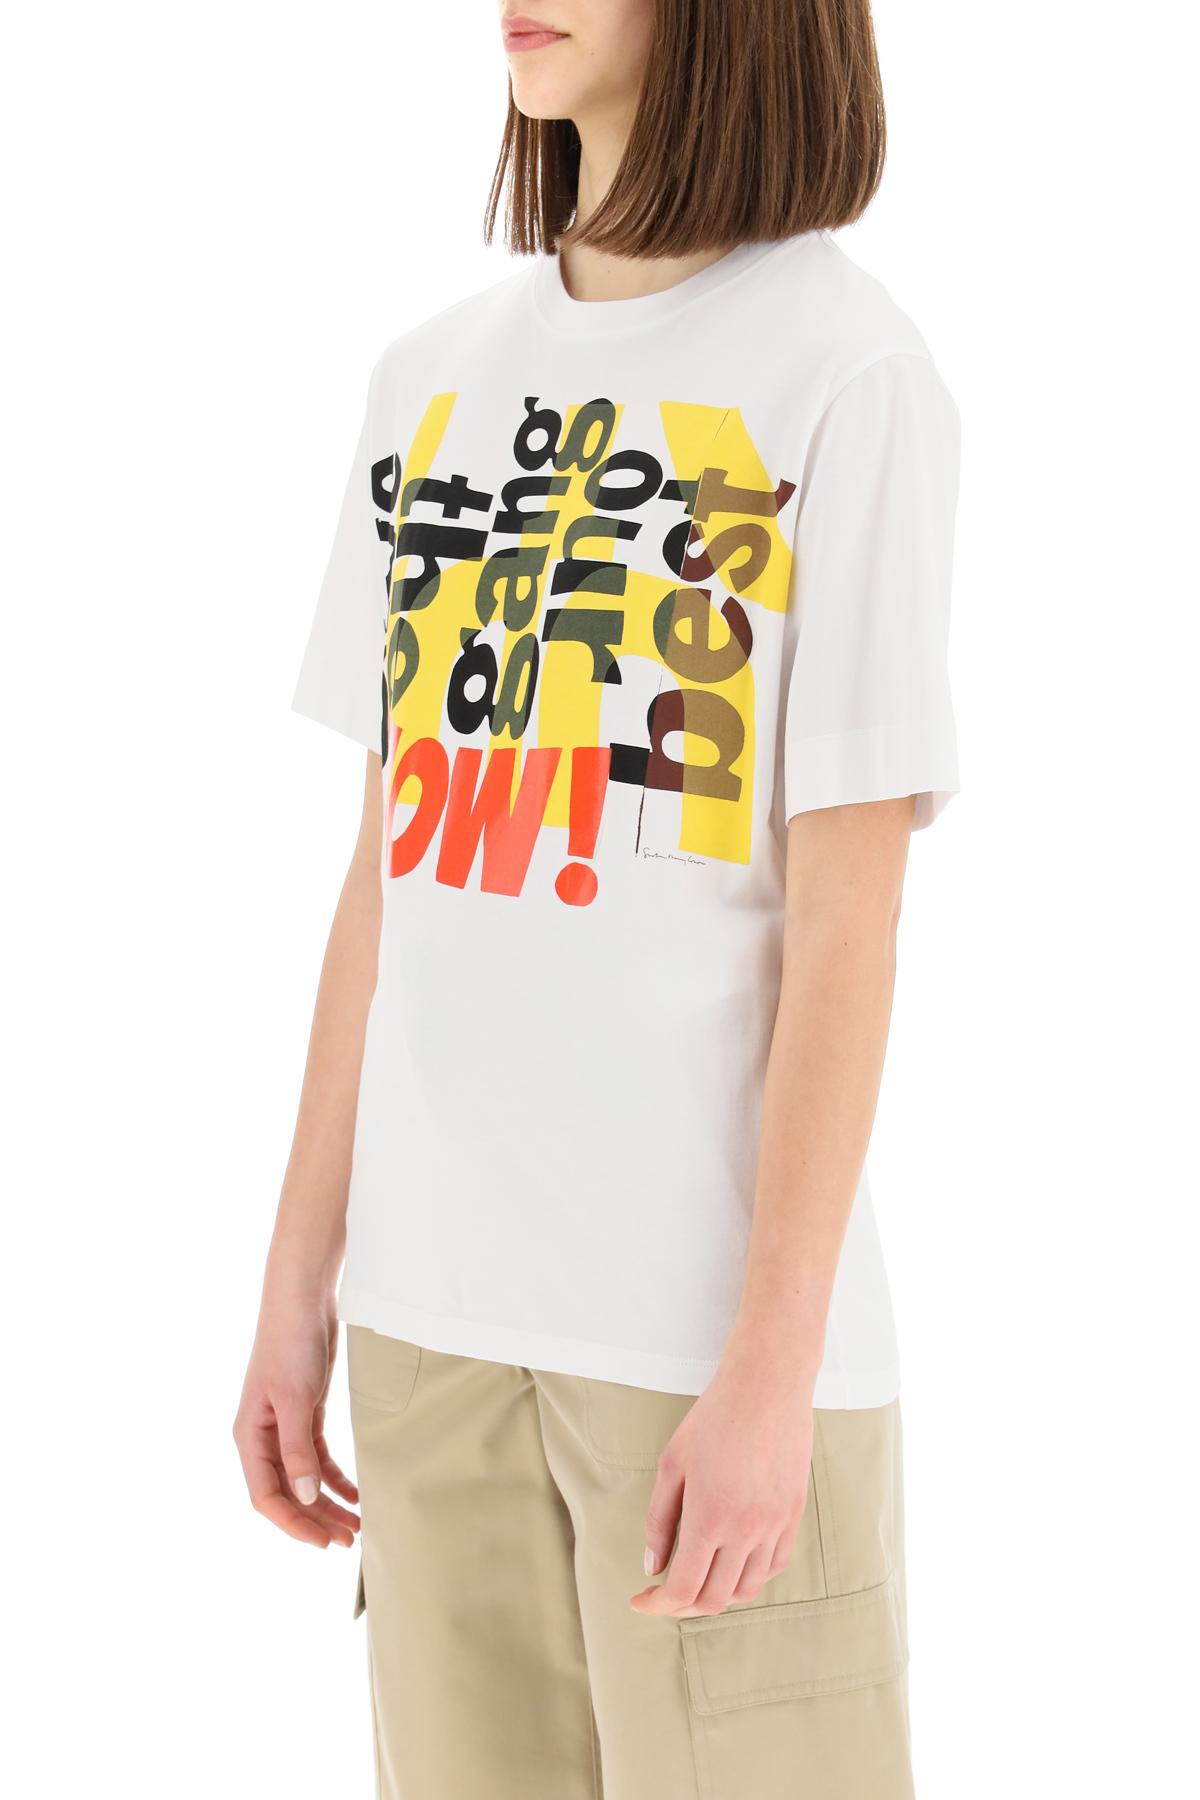 Chloe' t-shirt stampa artistica corita kent